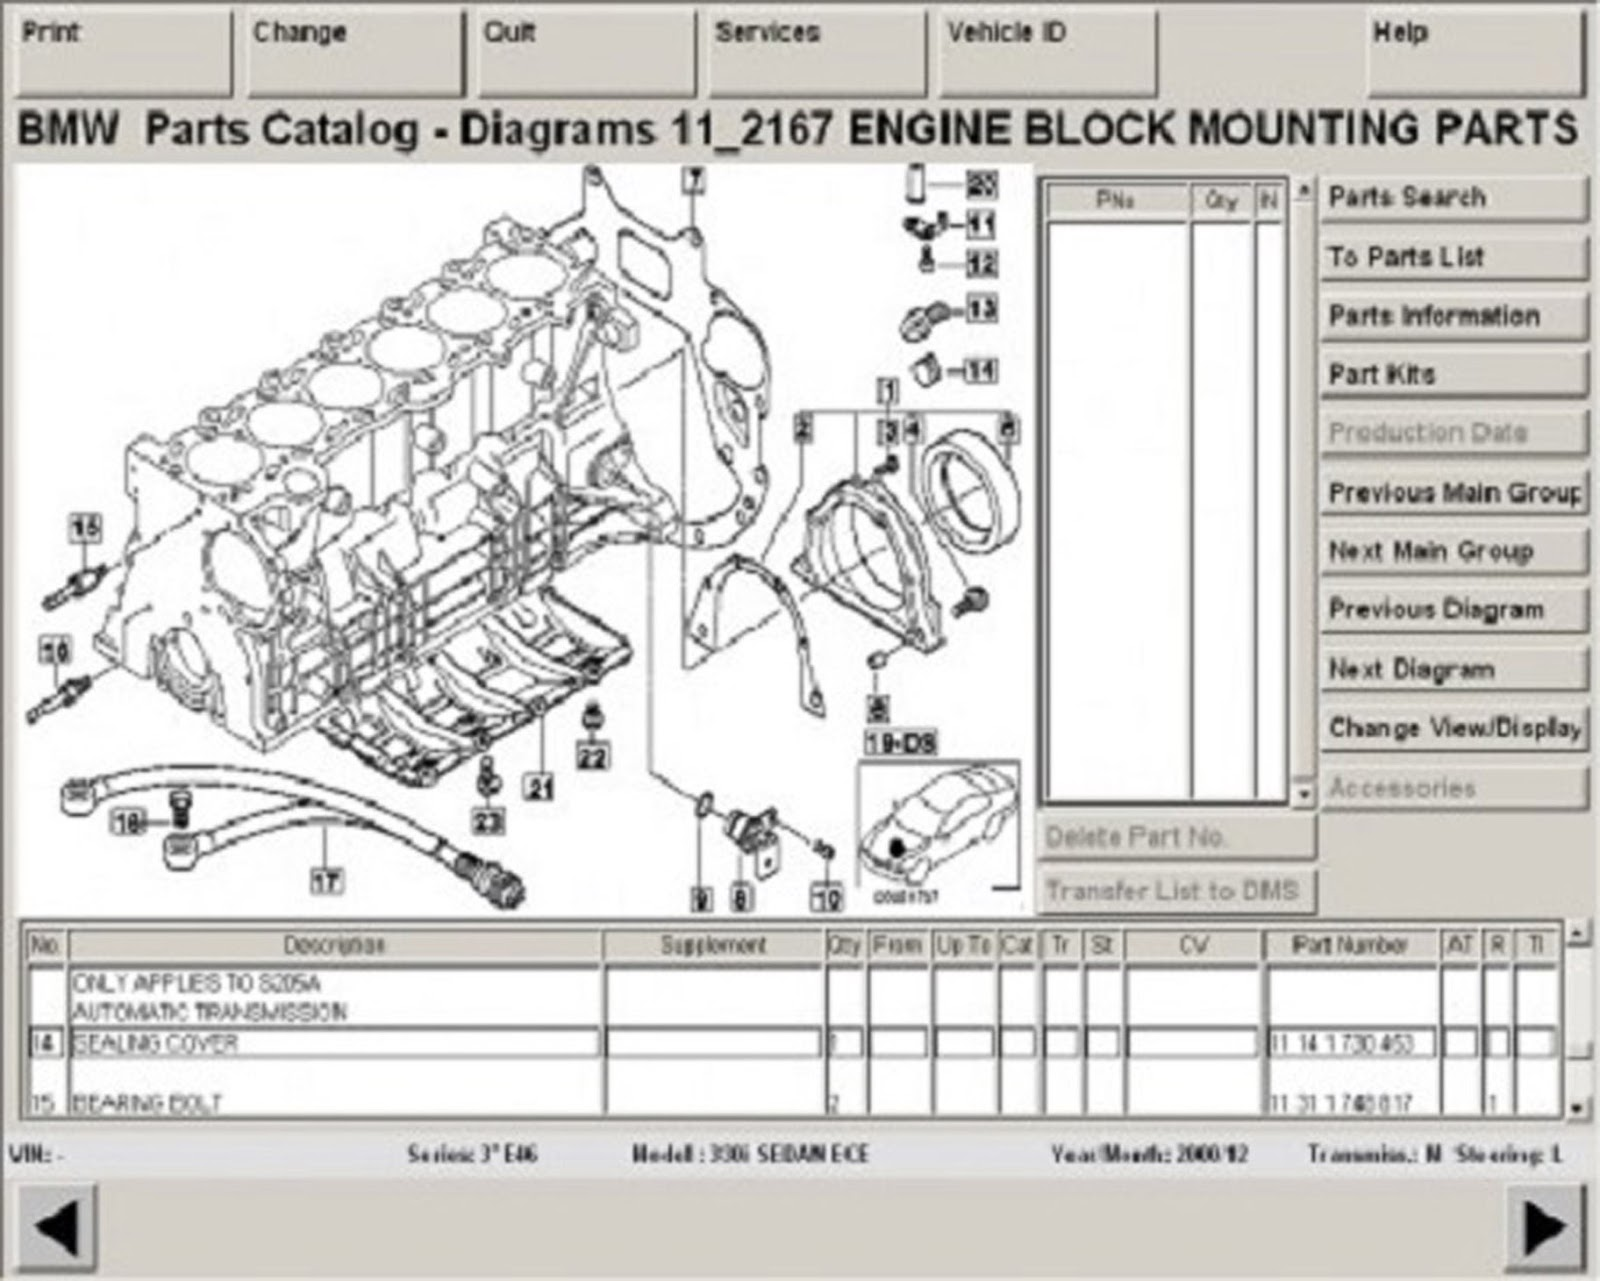 medium resolution of bmw workshop service repair manuals tis wds epc etk etm obd2 jombang electrical wiring diagram